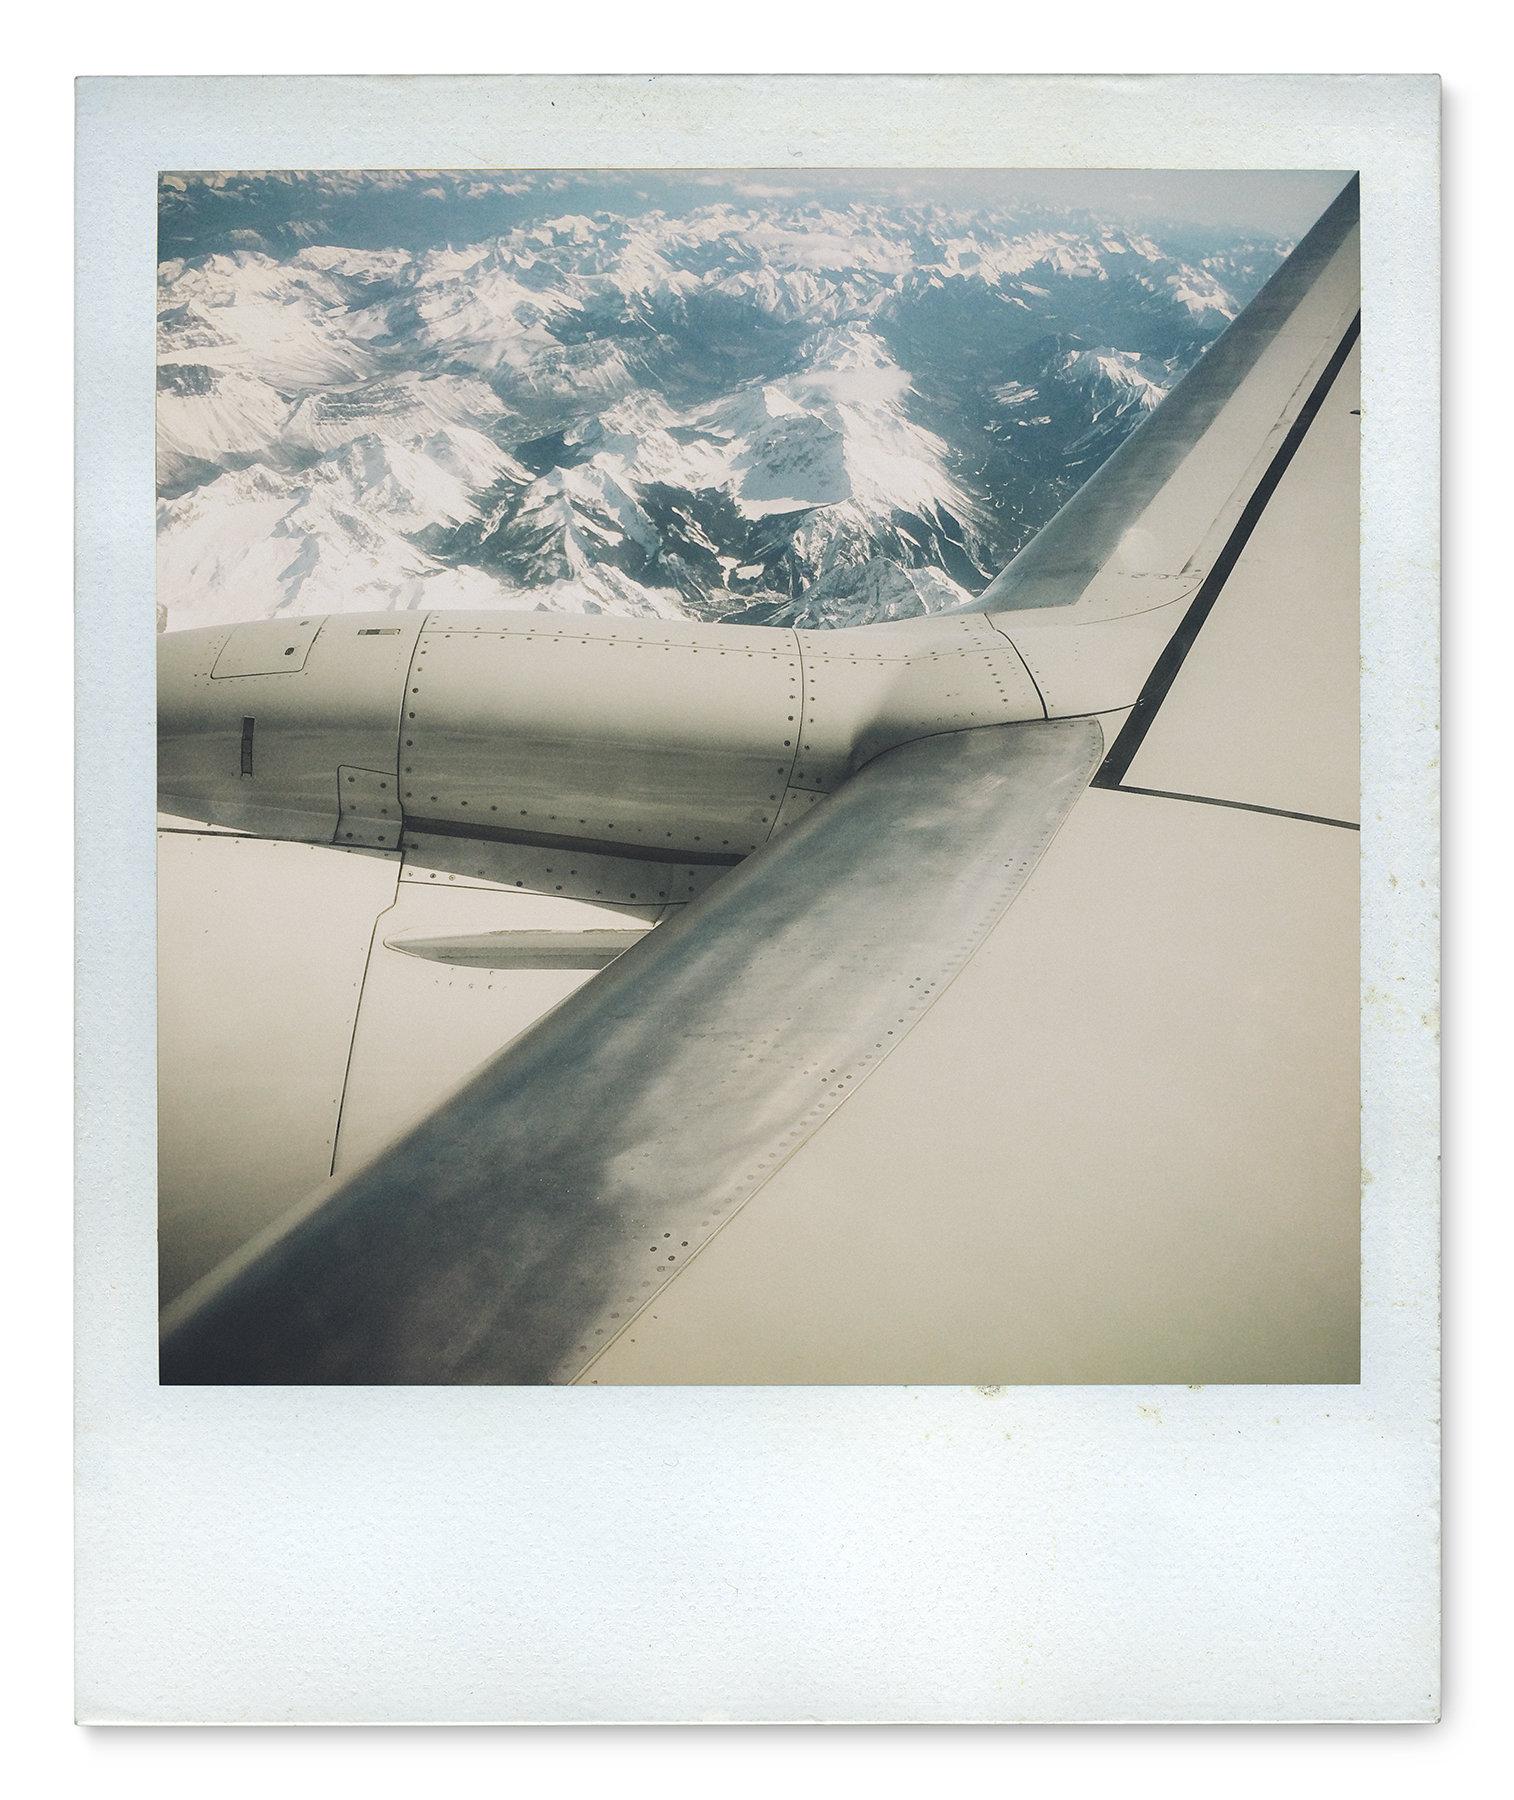 057_Polaroid SX70_IMG_1935.jpg